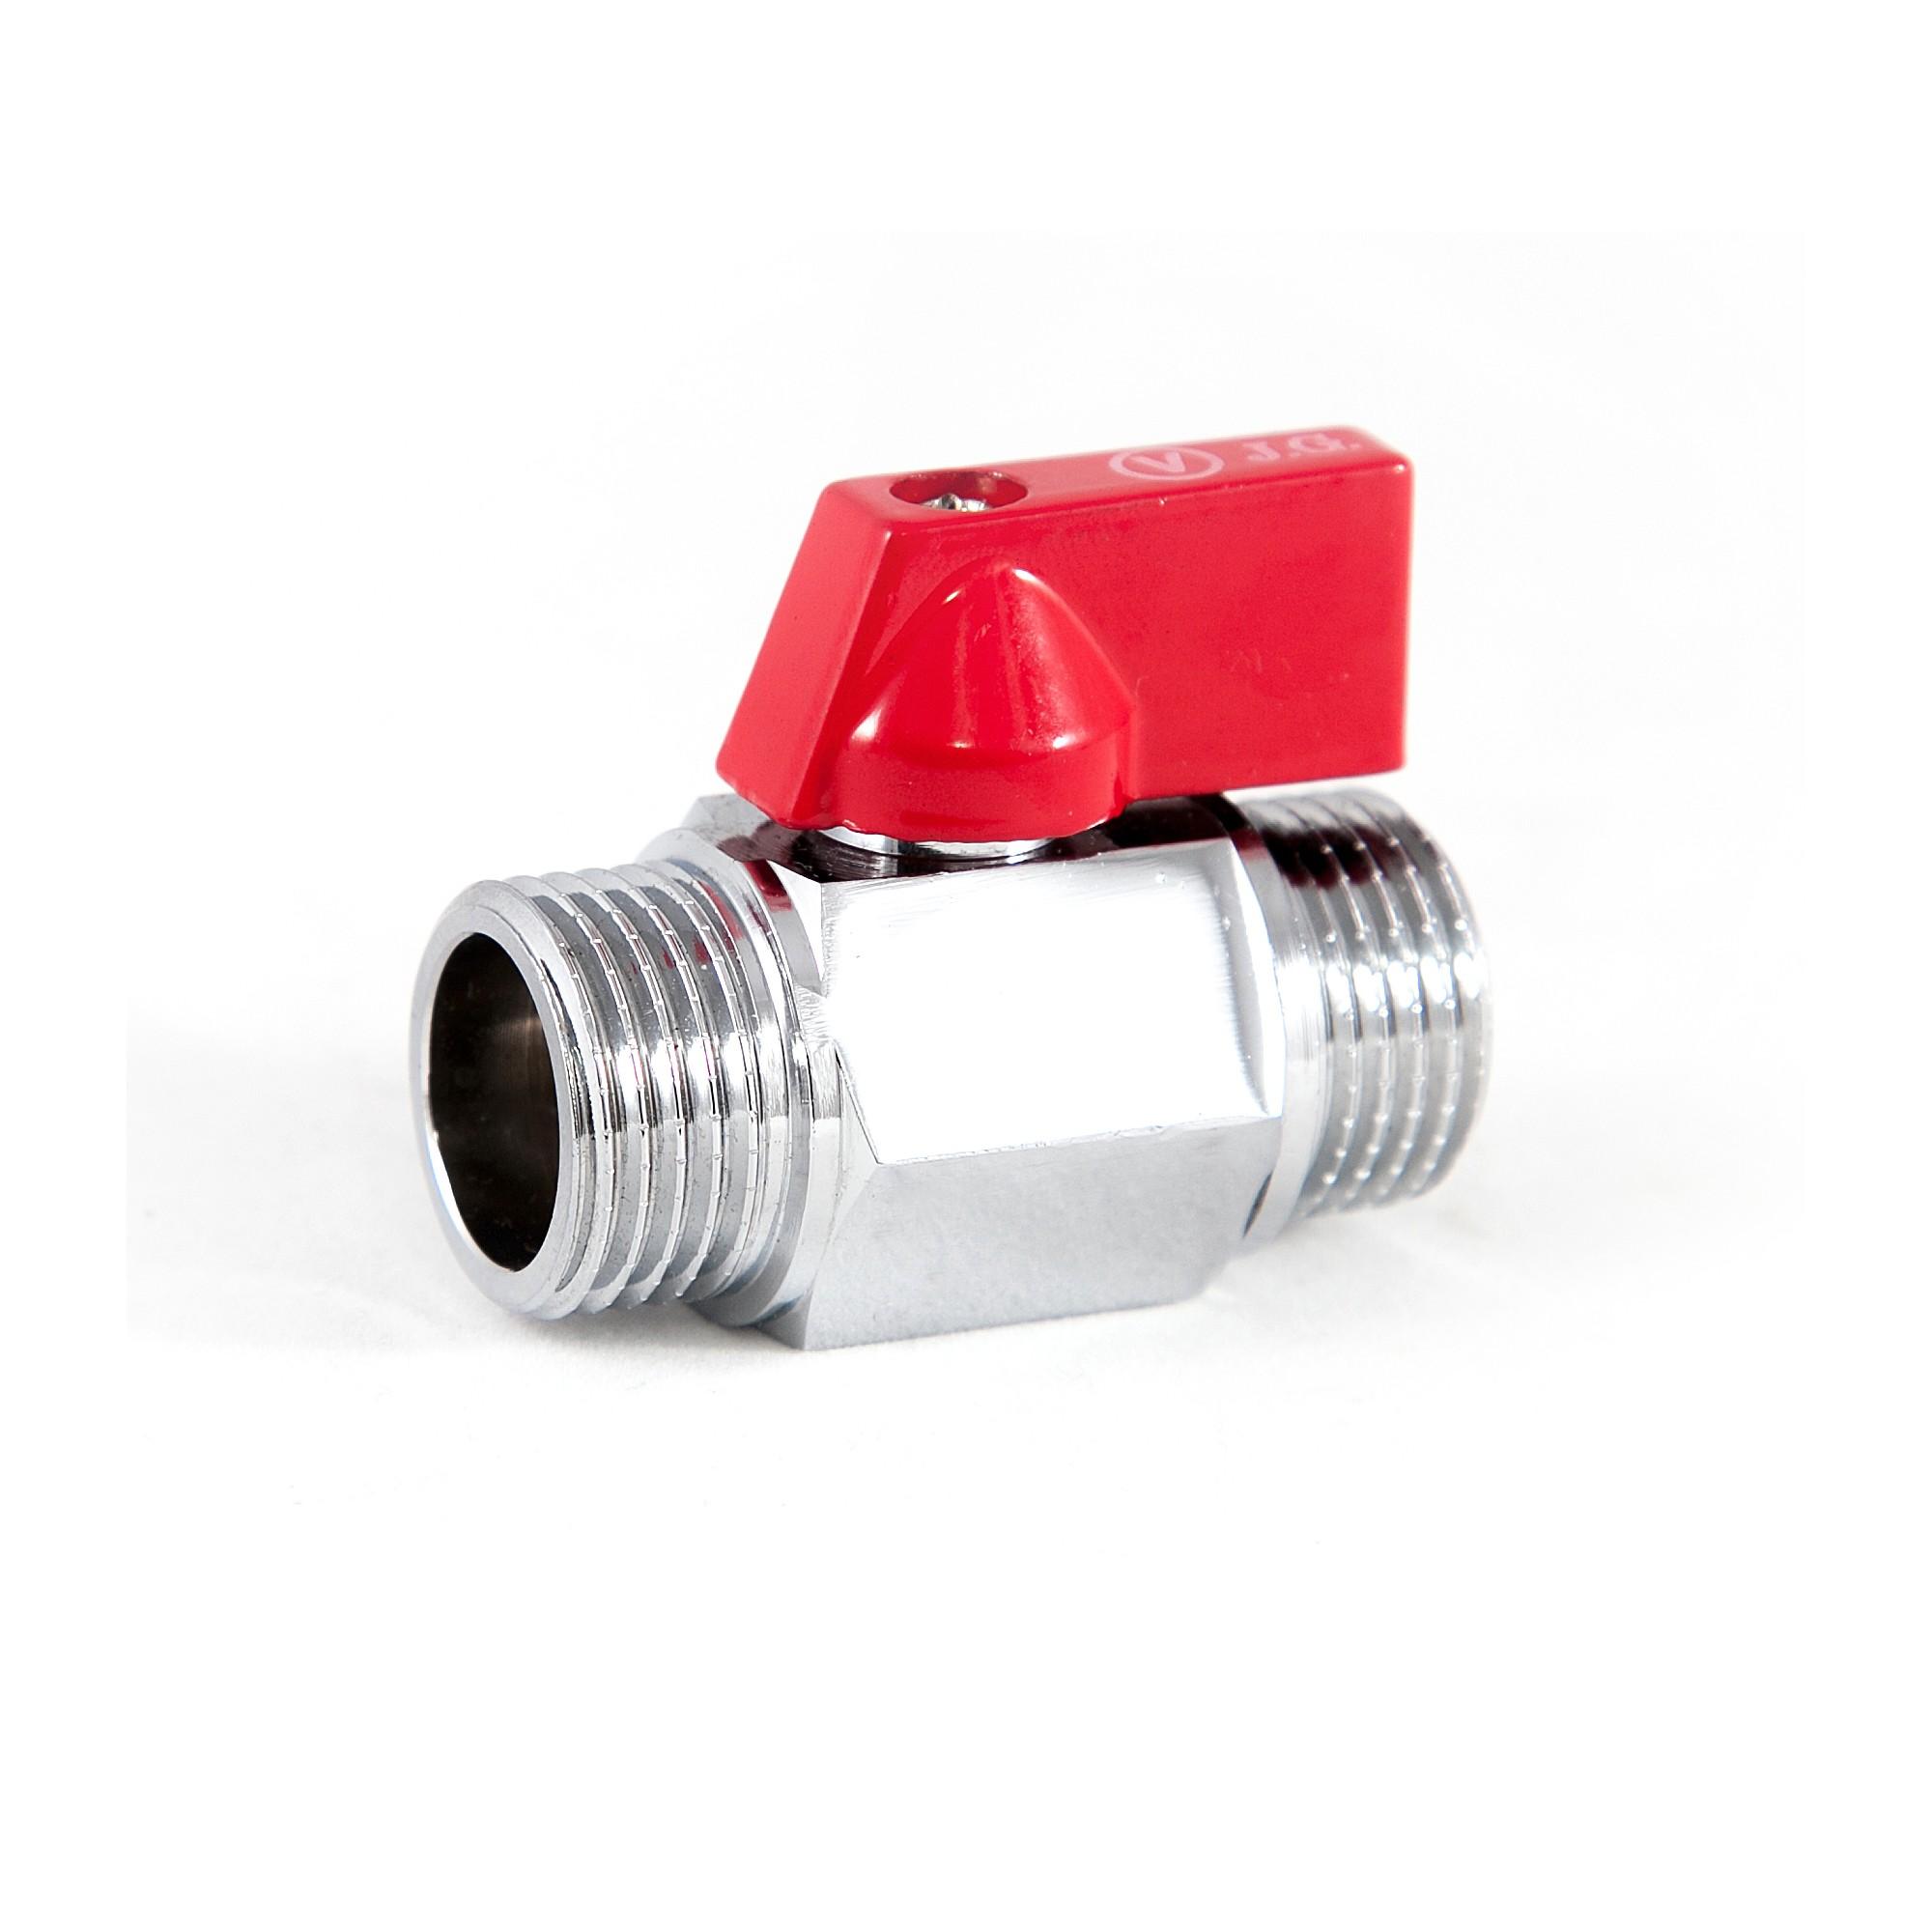 Кран шаровый MINI мини приборный 1/2'' нн Valve J.G. J.G. - 1